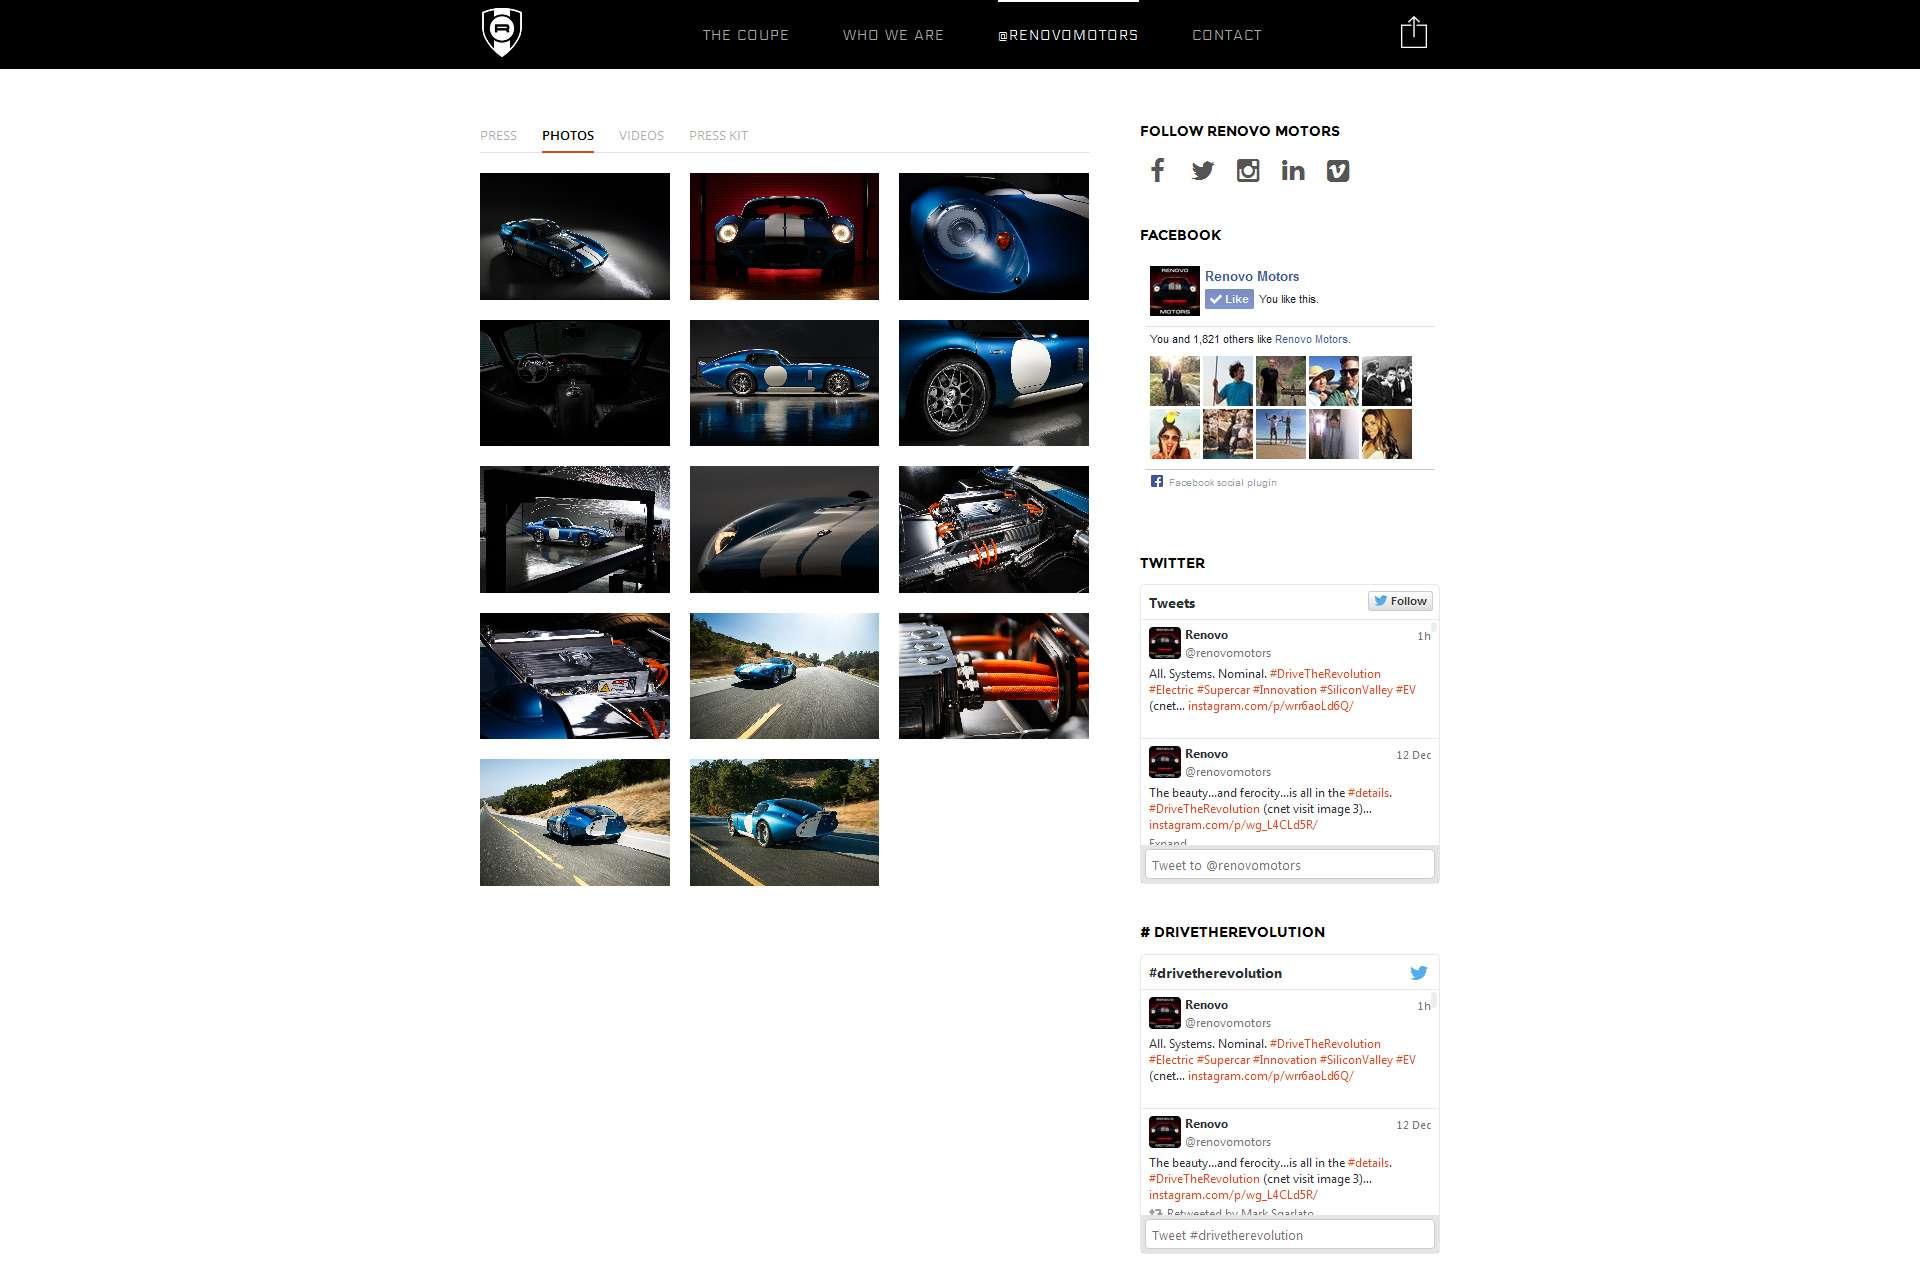 Renovo-motors-photos